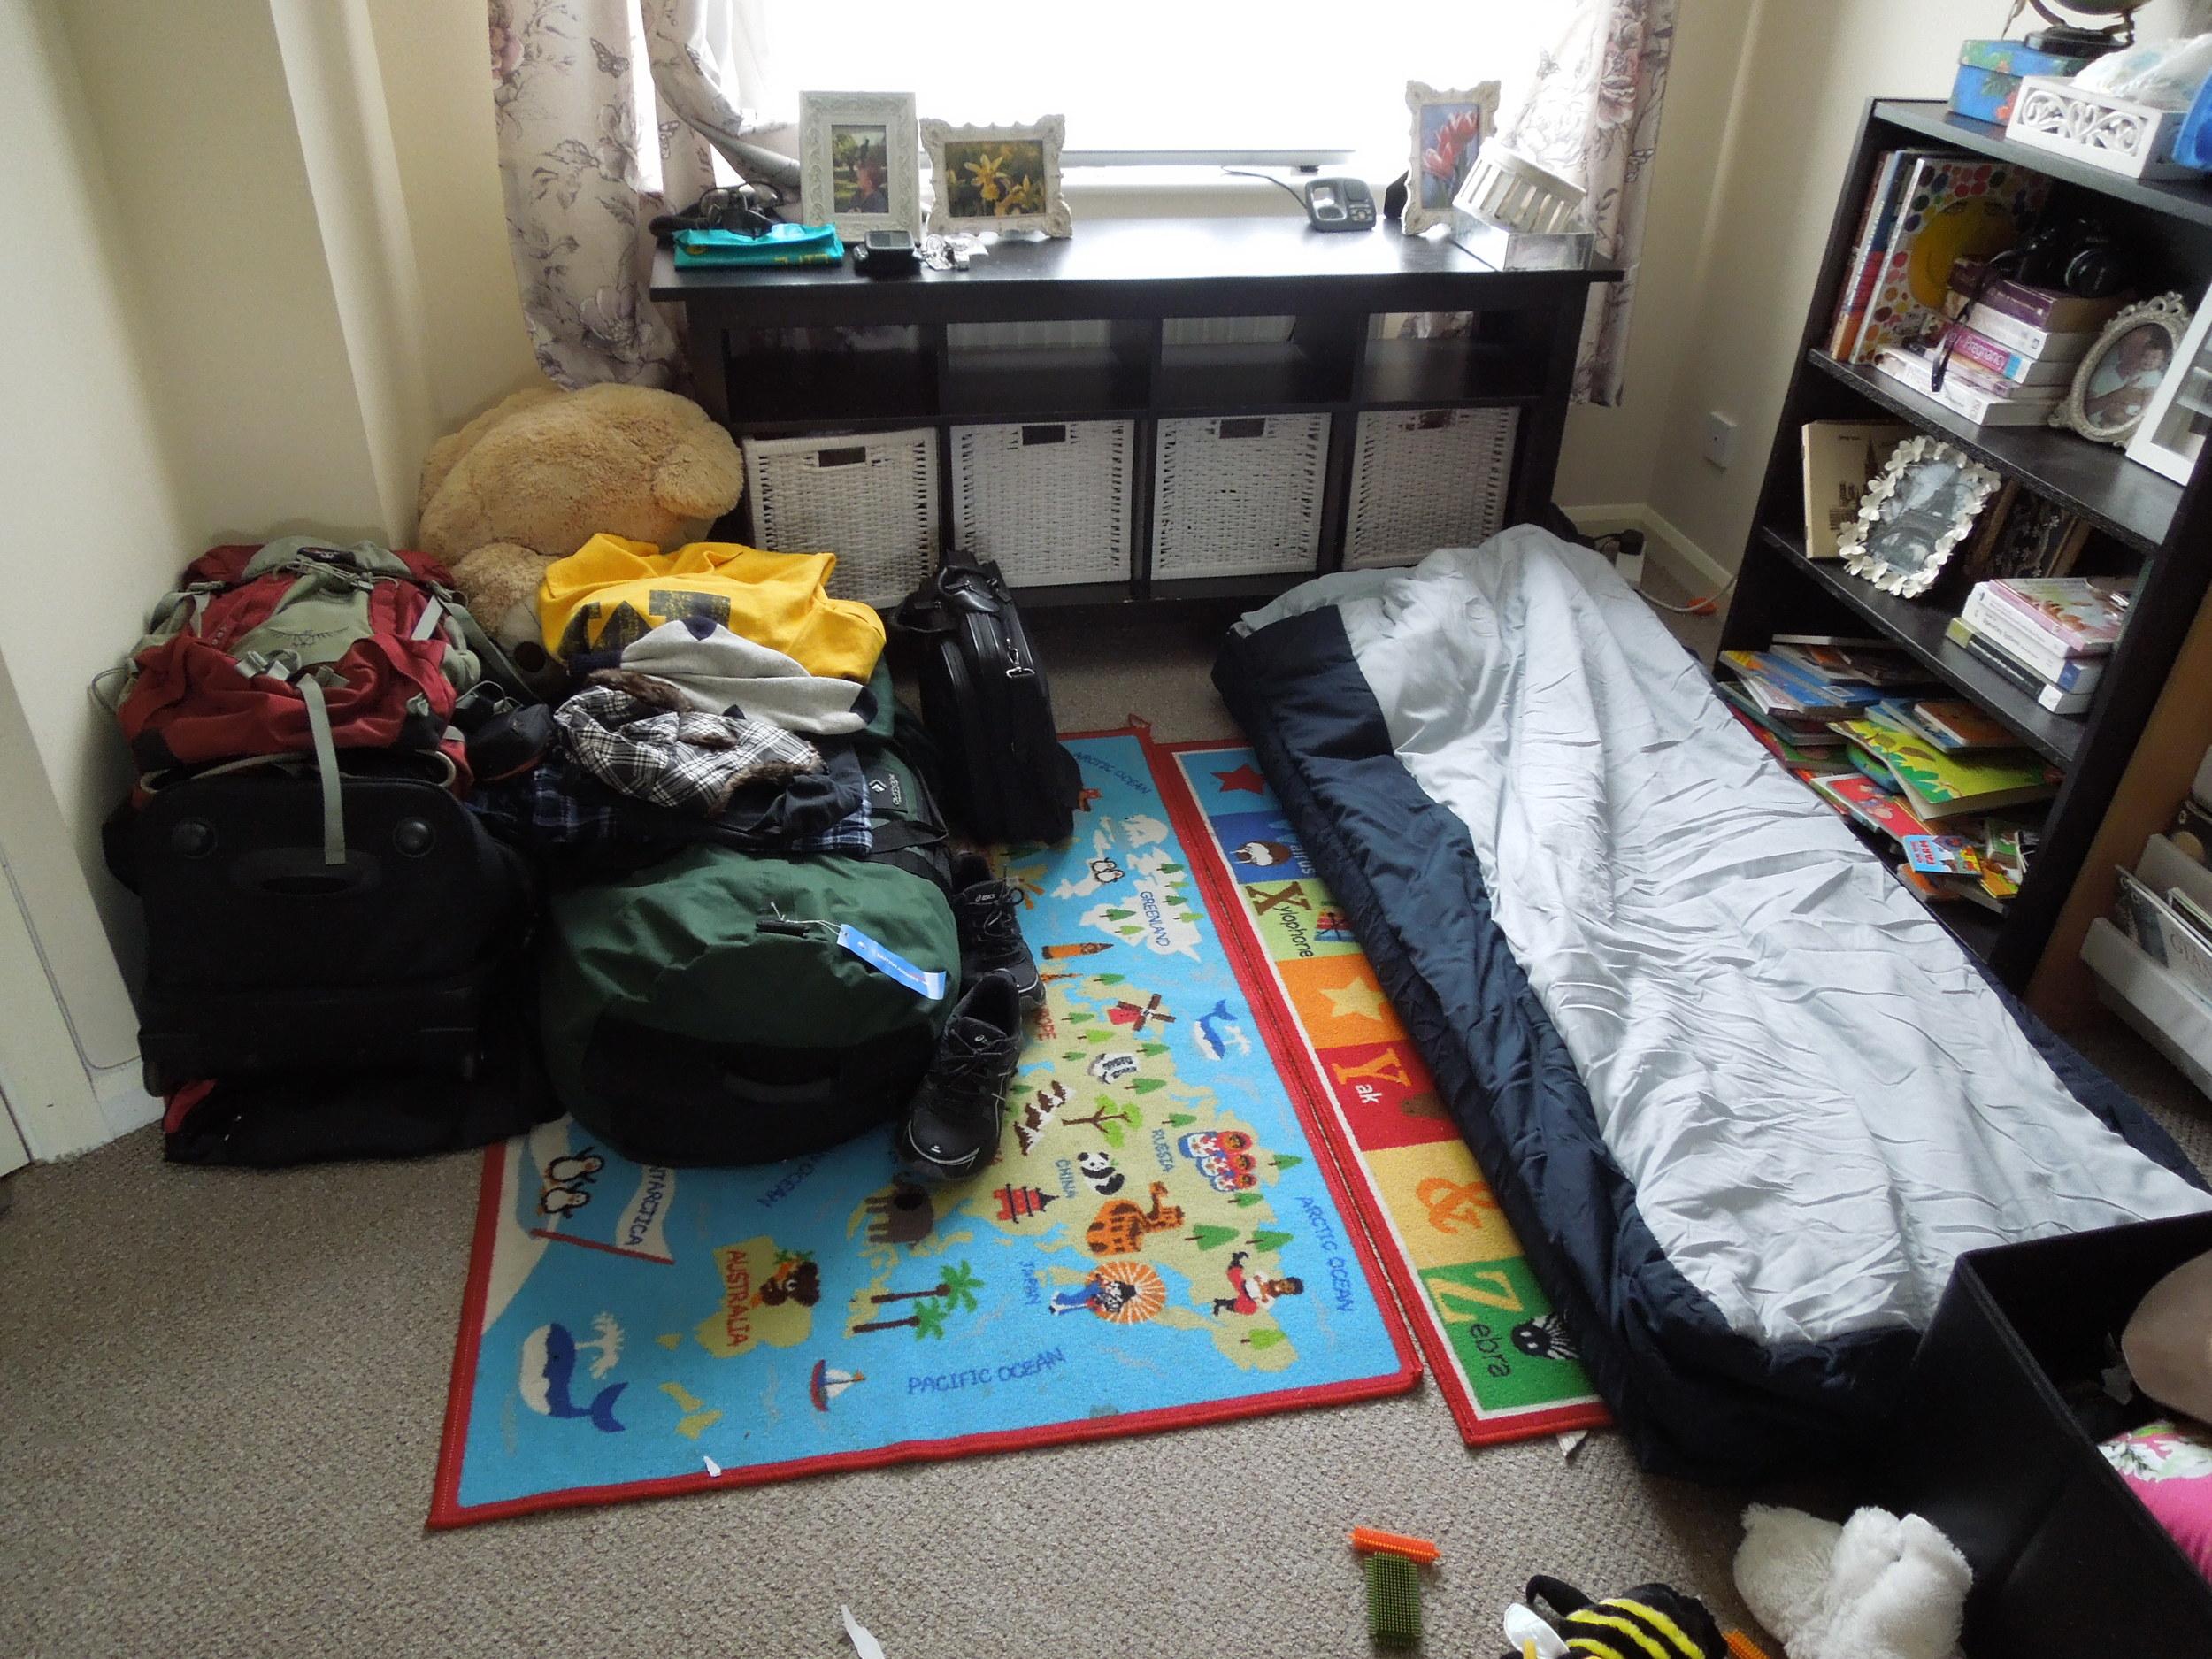 My sleeping quarters